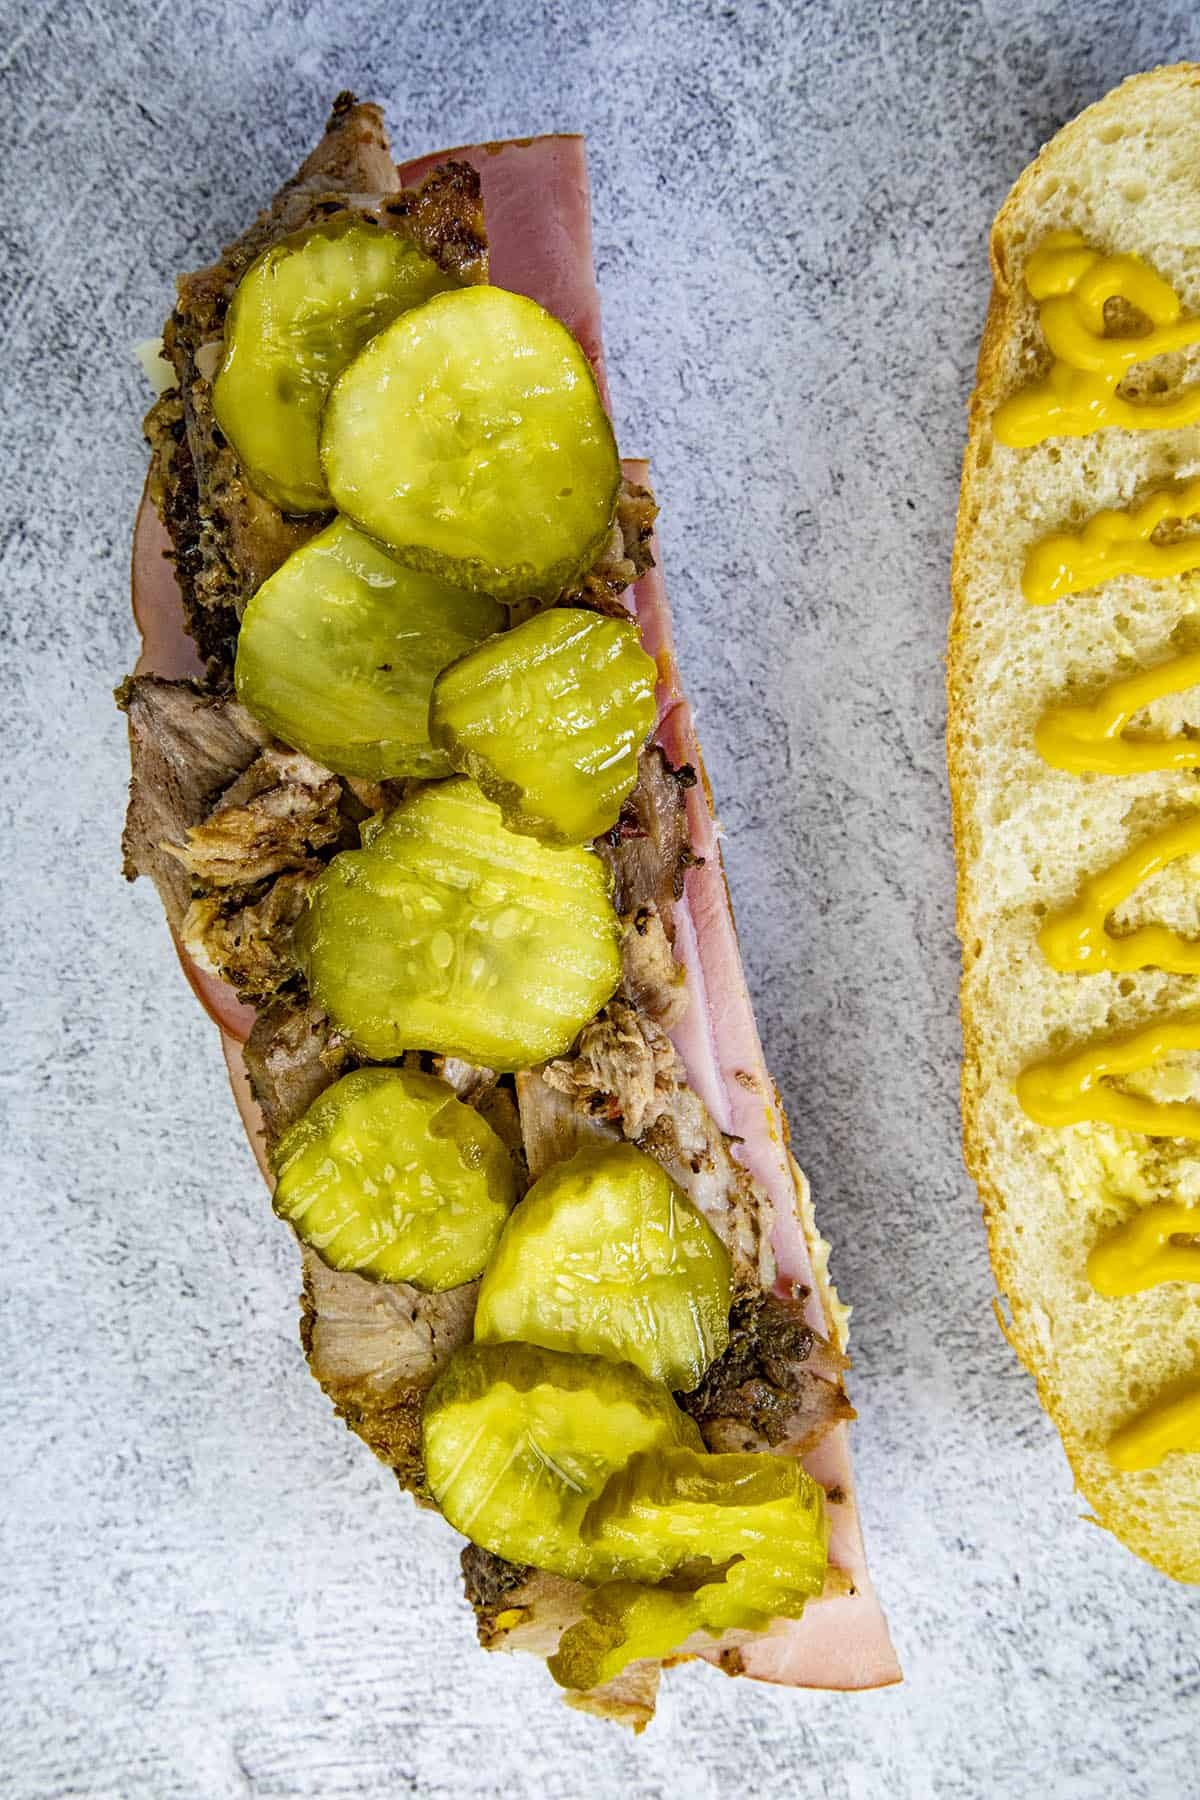 Layering up a Cuban Sandwich